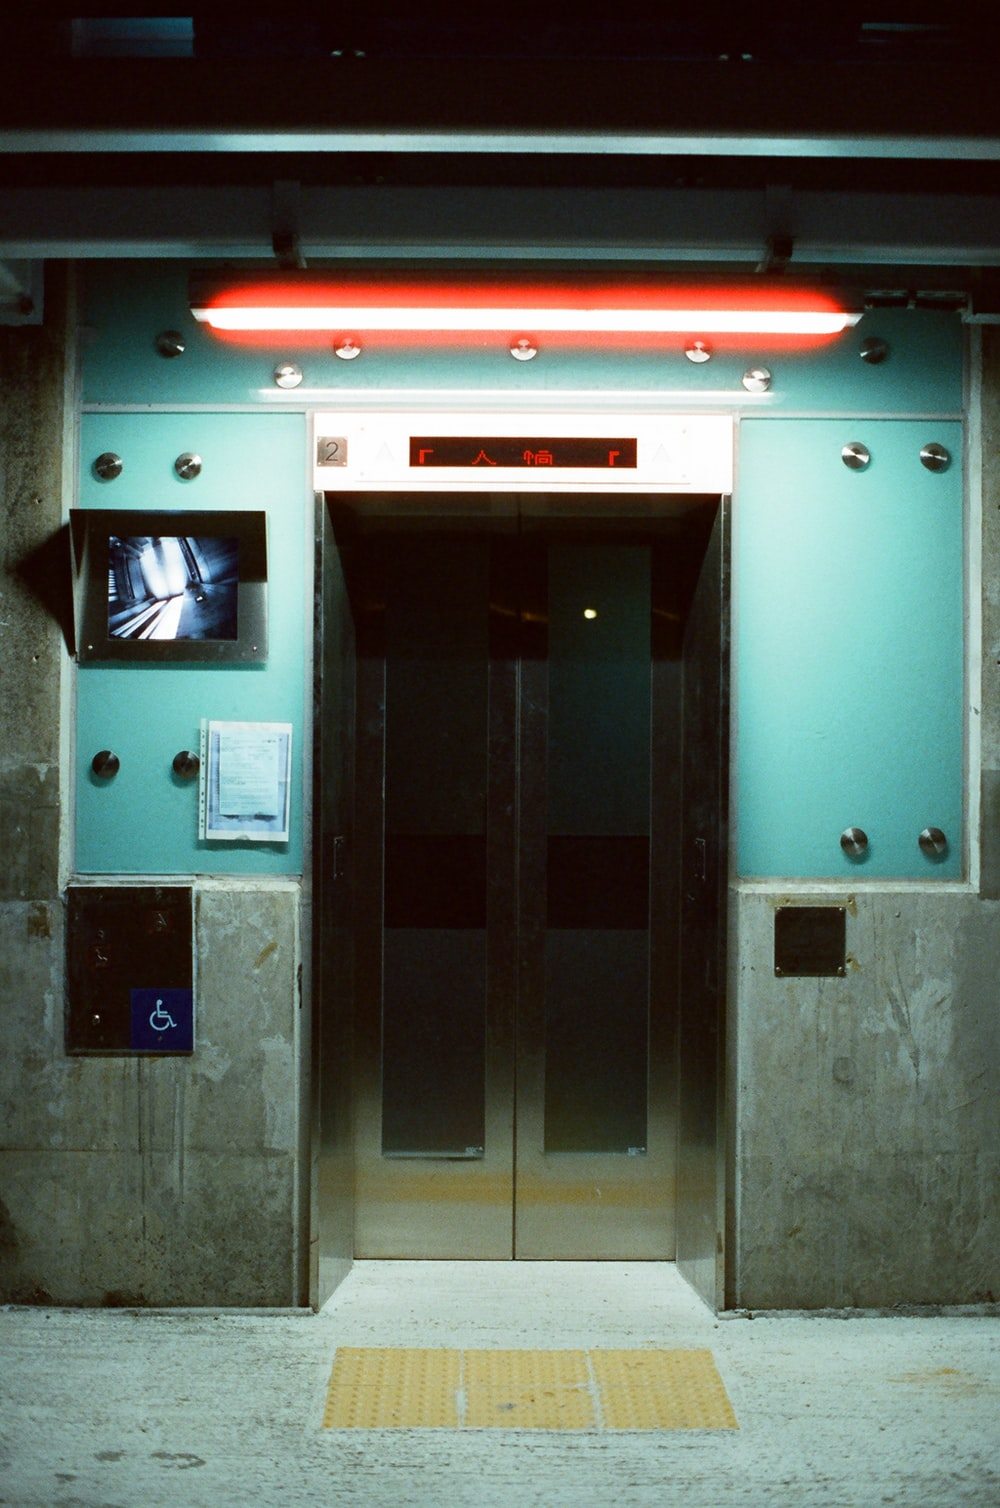 turned on light outside an elevator